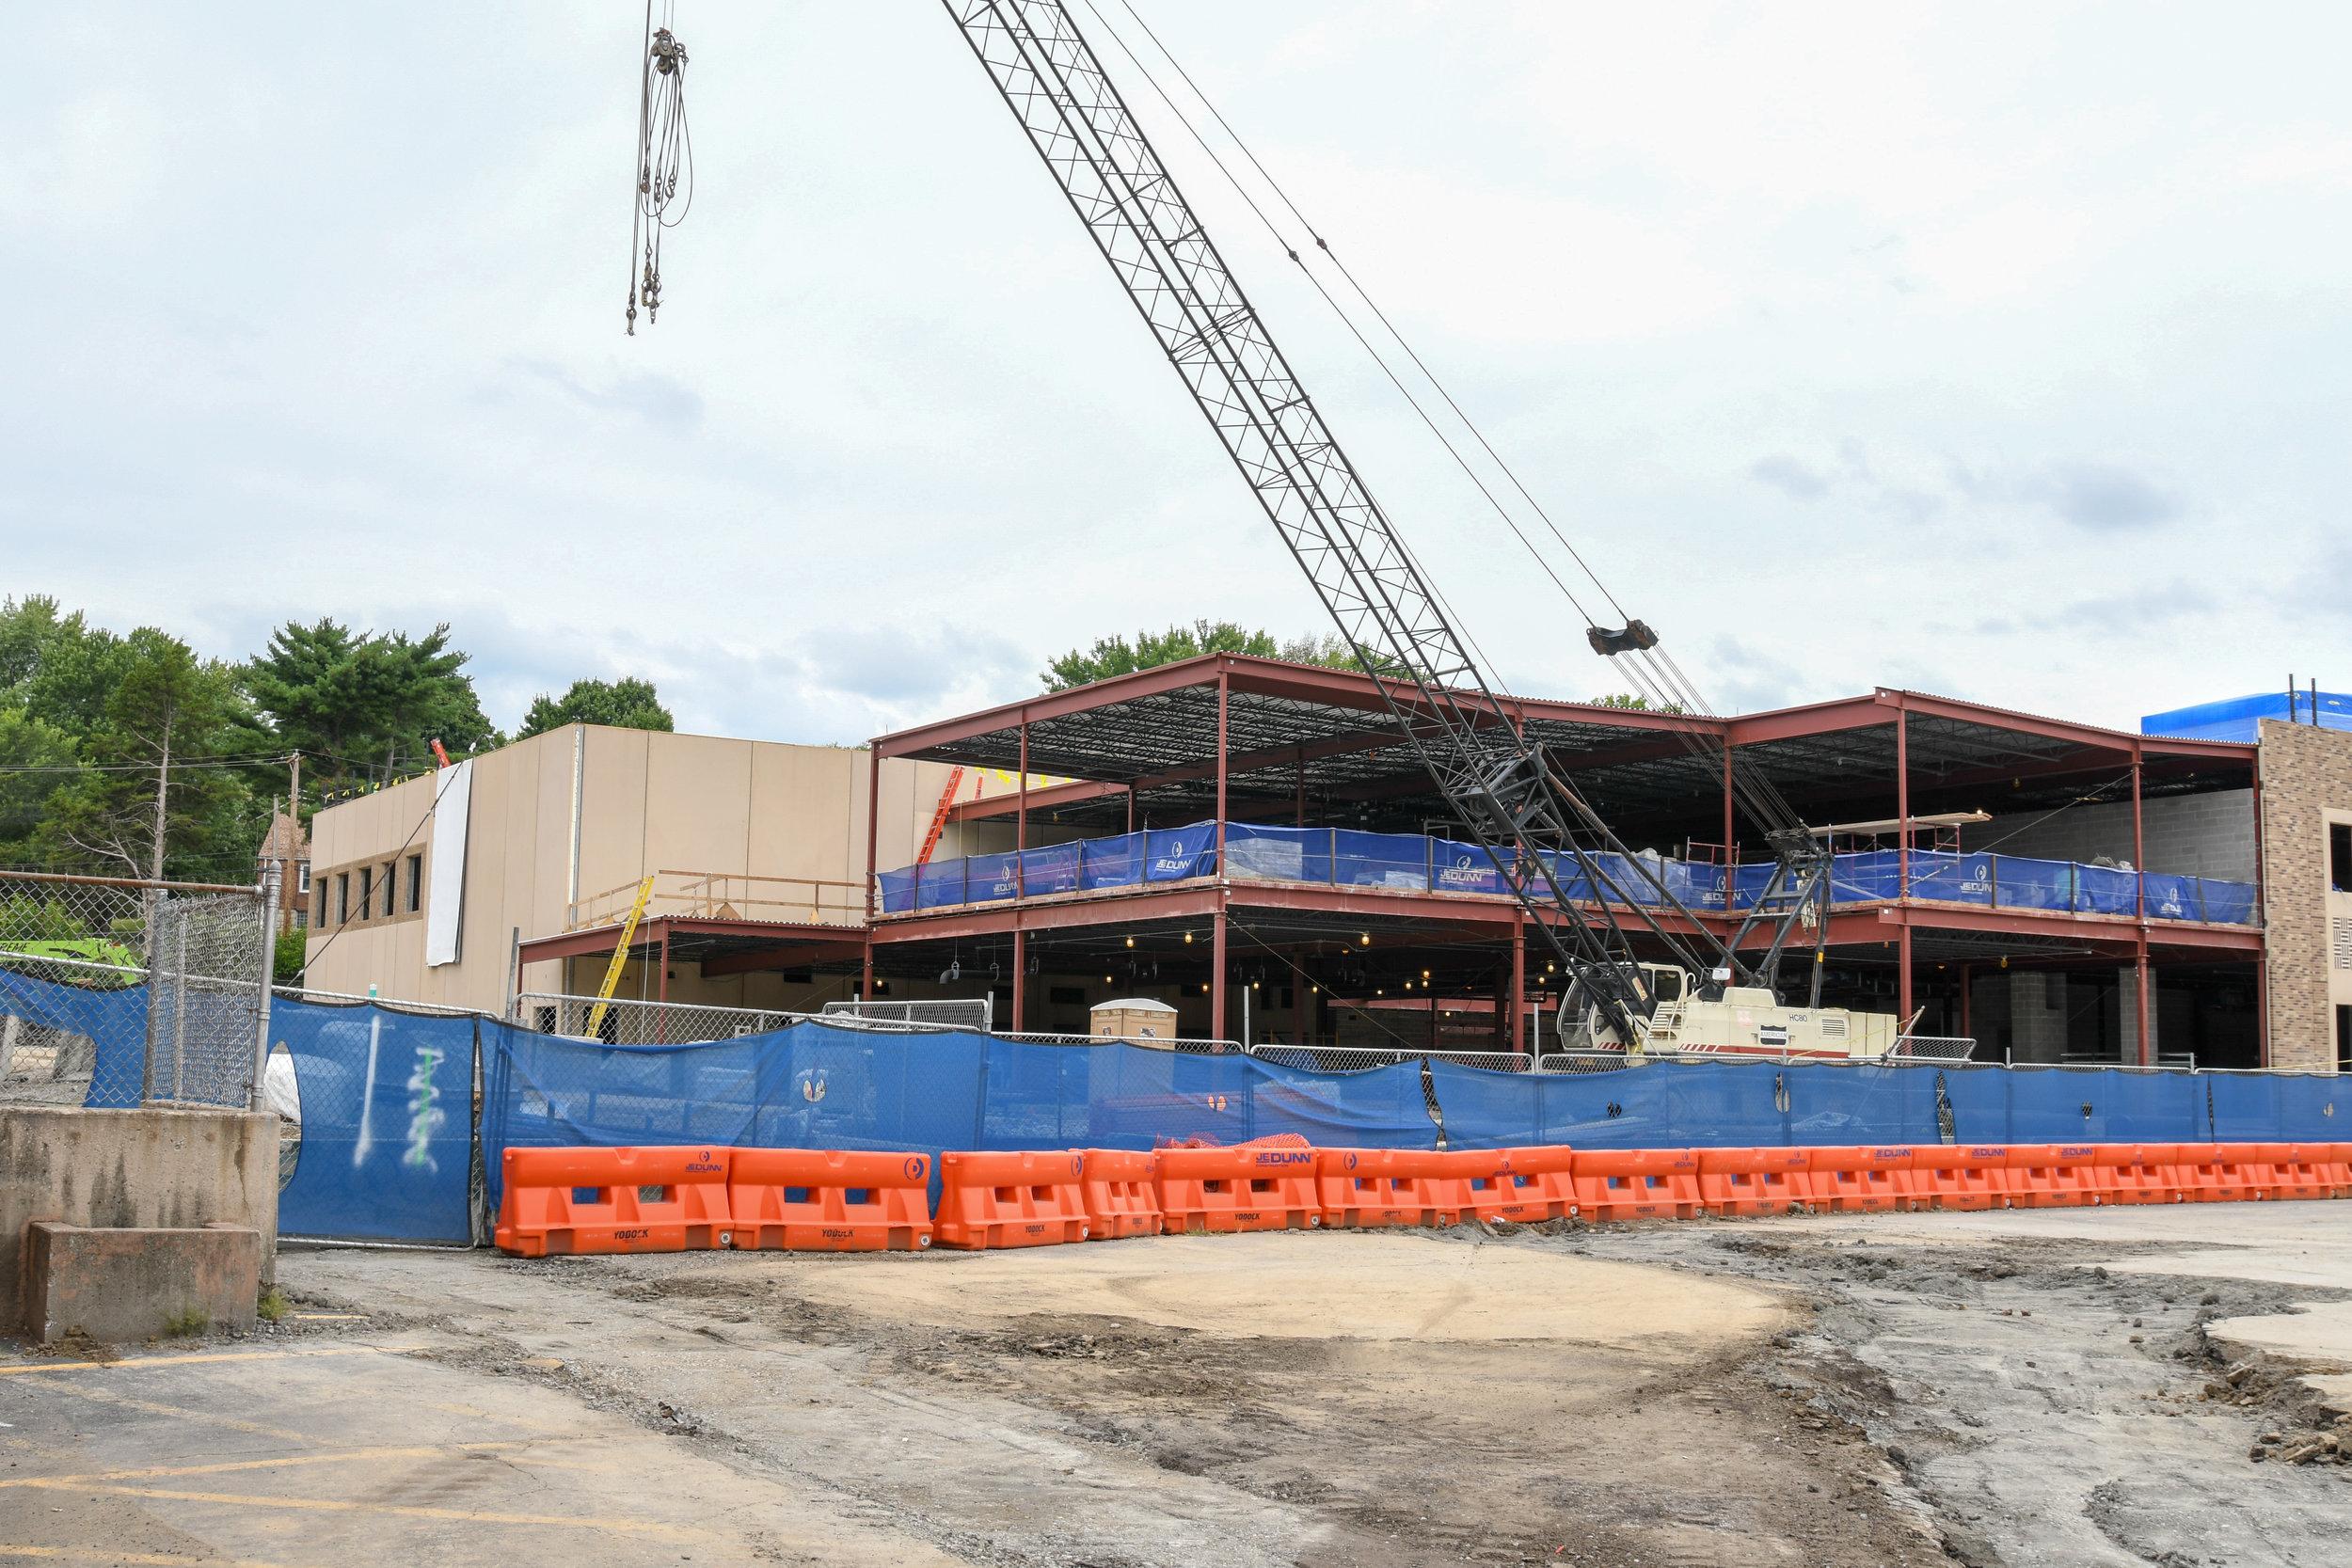 Welborn Construction